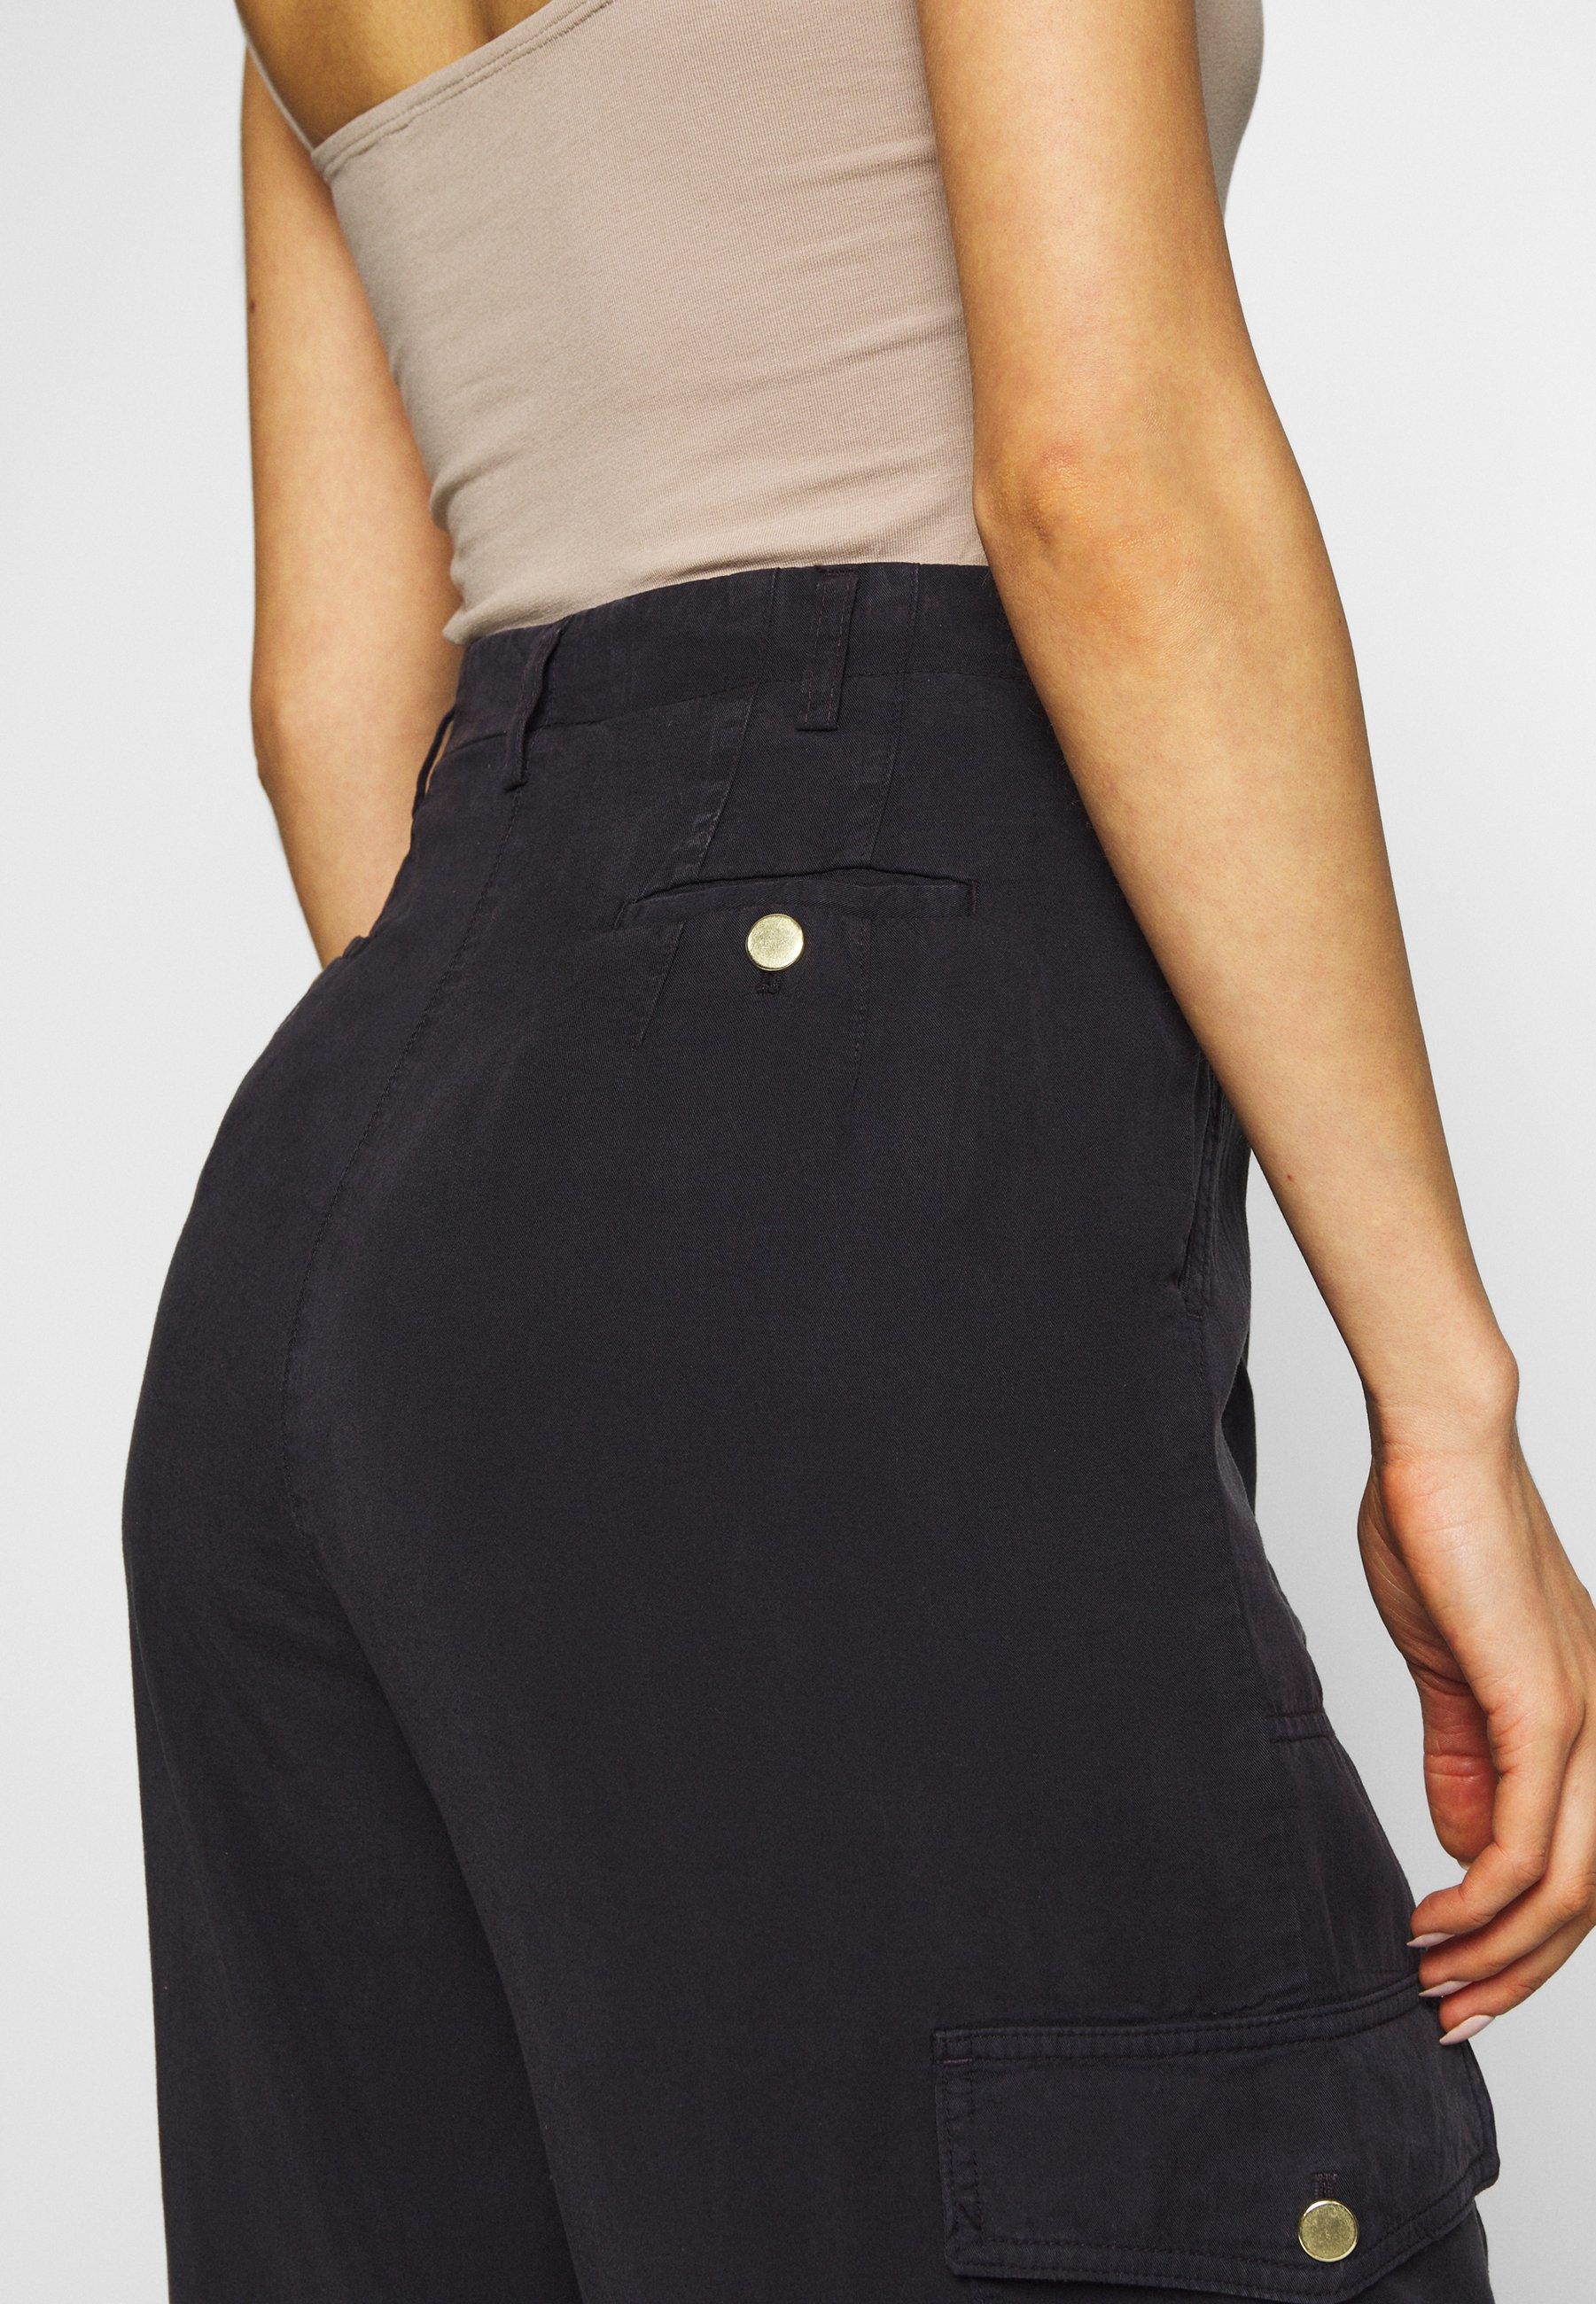 H2o Fagerholt Ready To Wear Pants - Stoffhose Black Friday